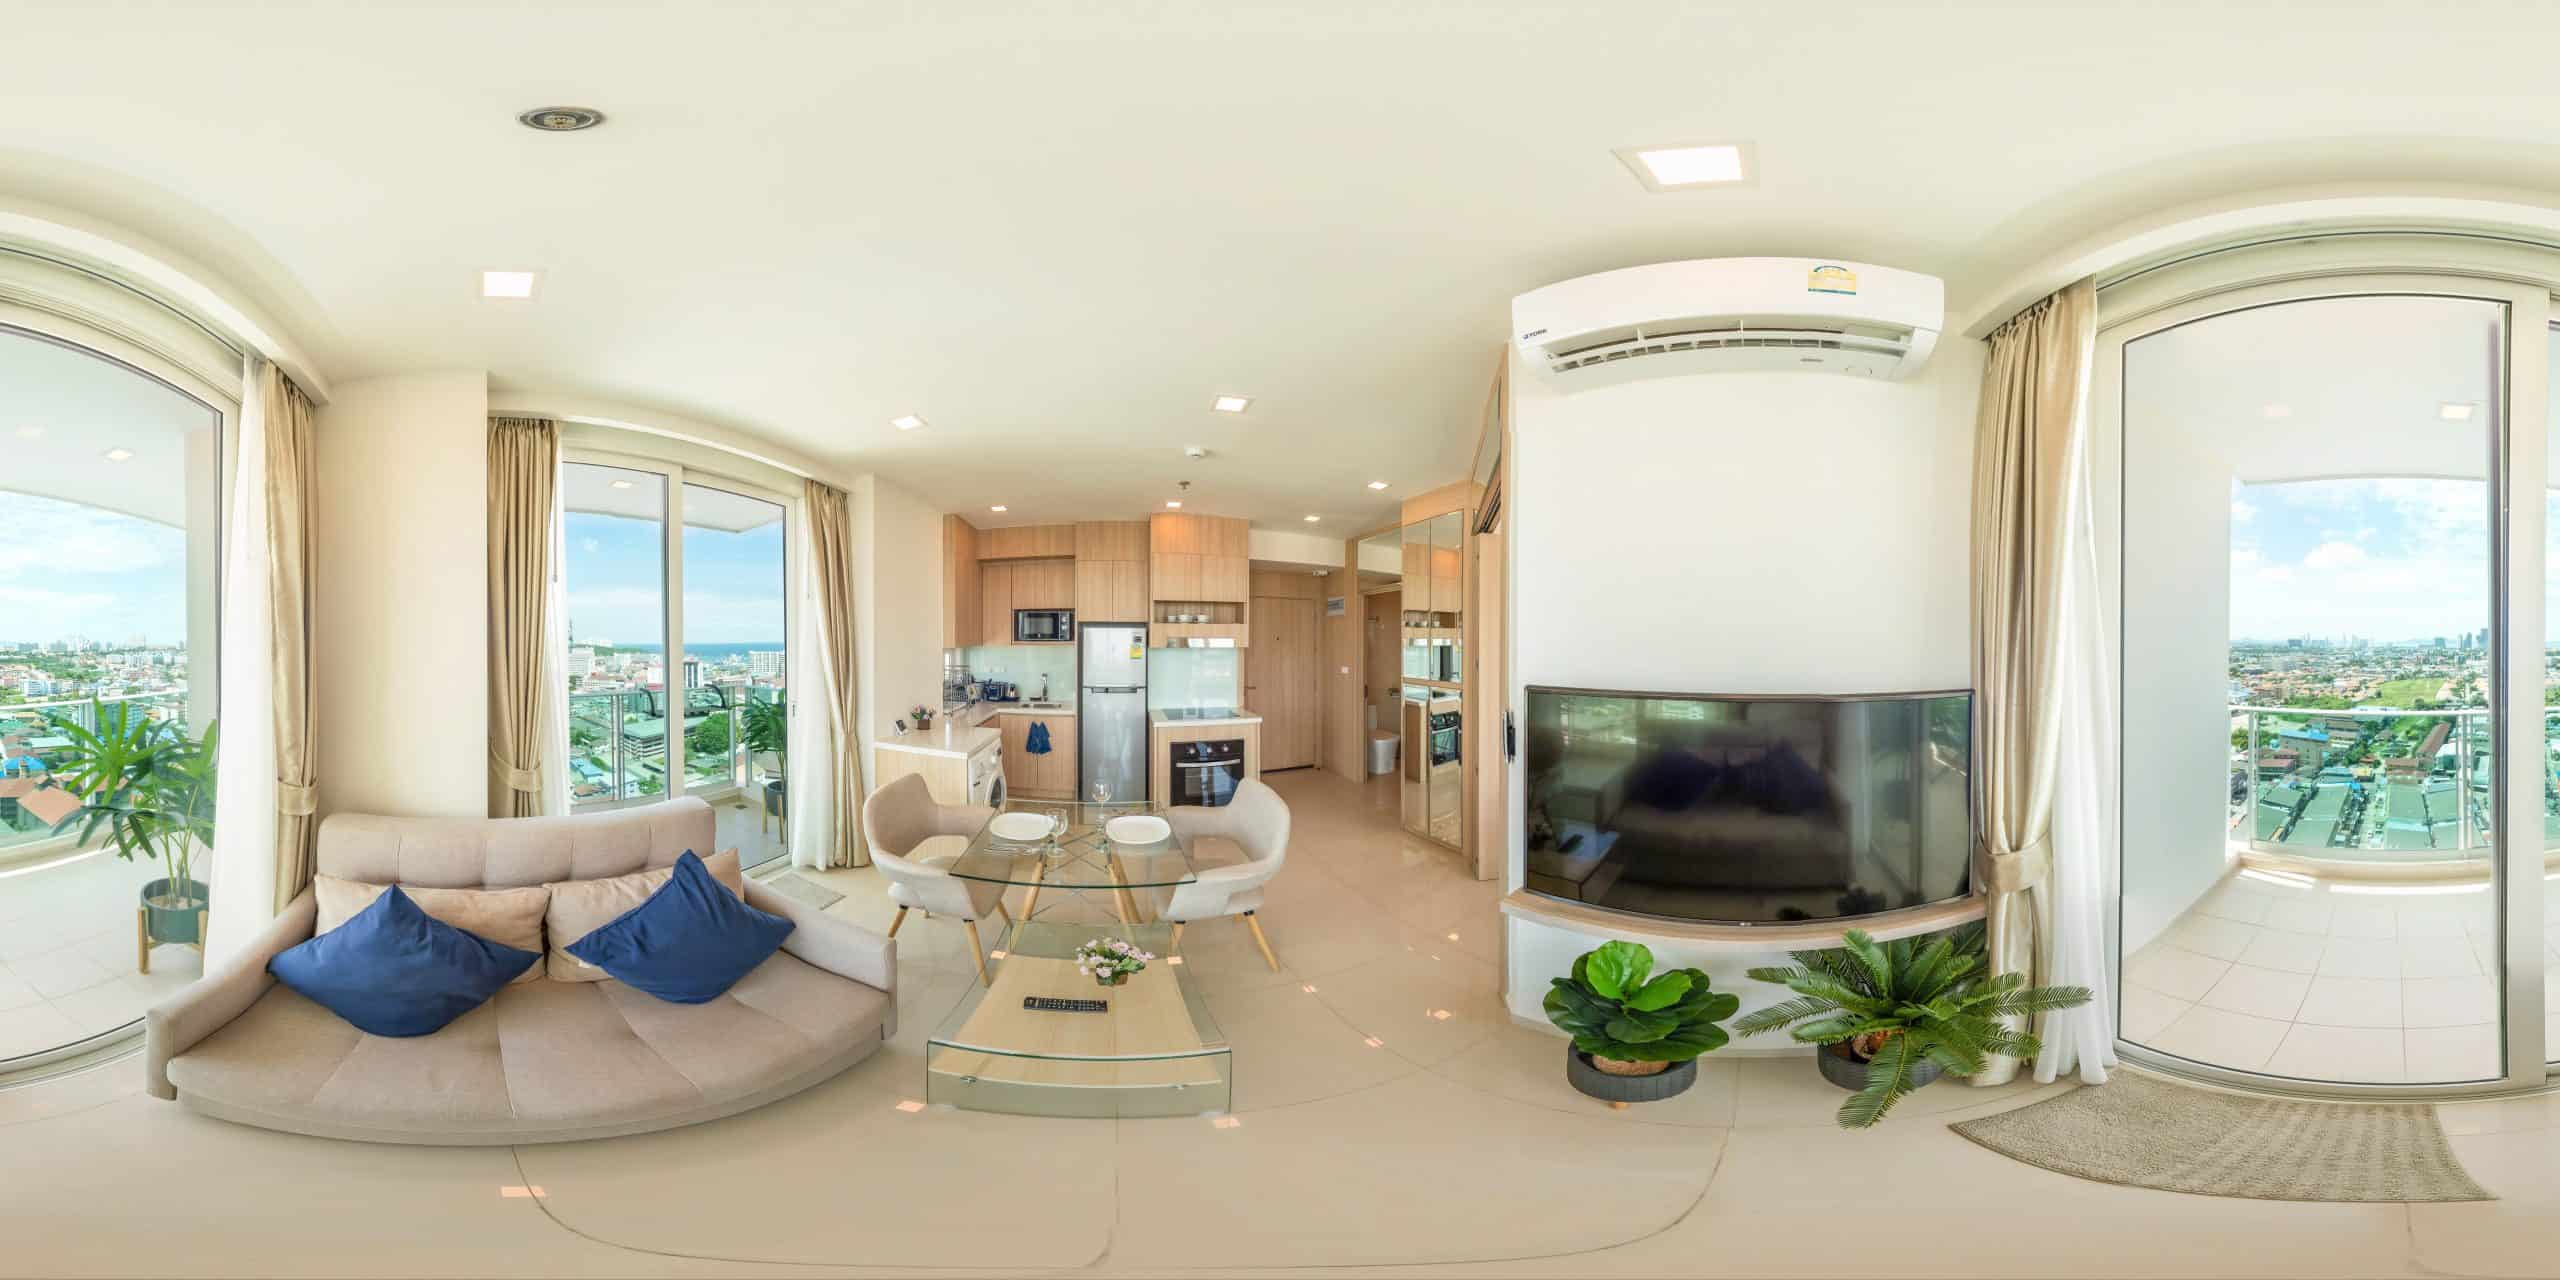 Studio Condo Pictures at City Garden Tower Pattaya